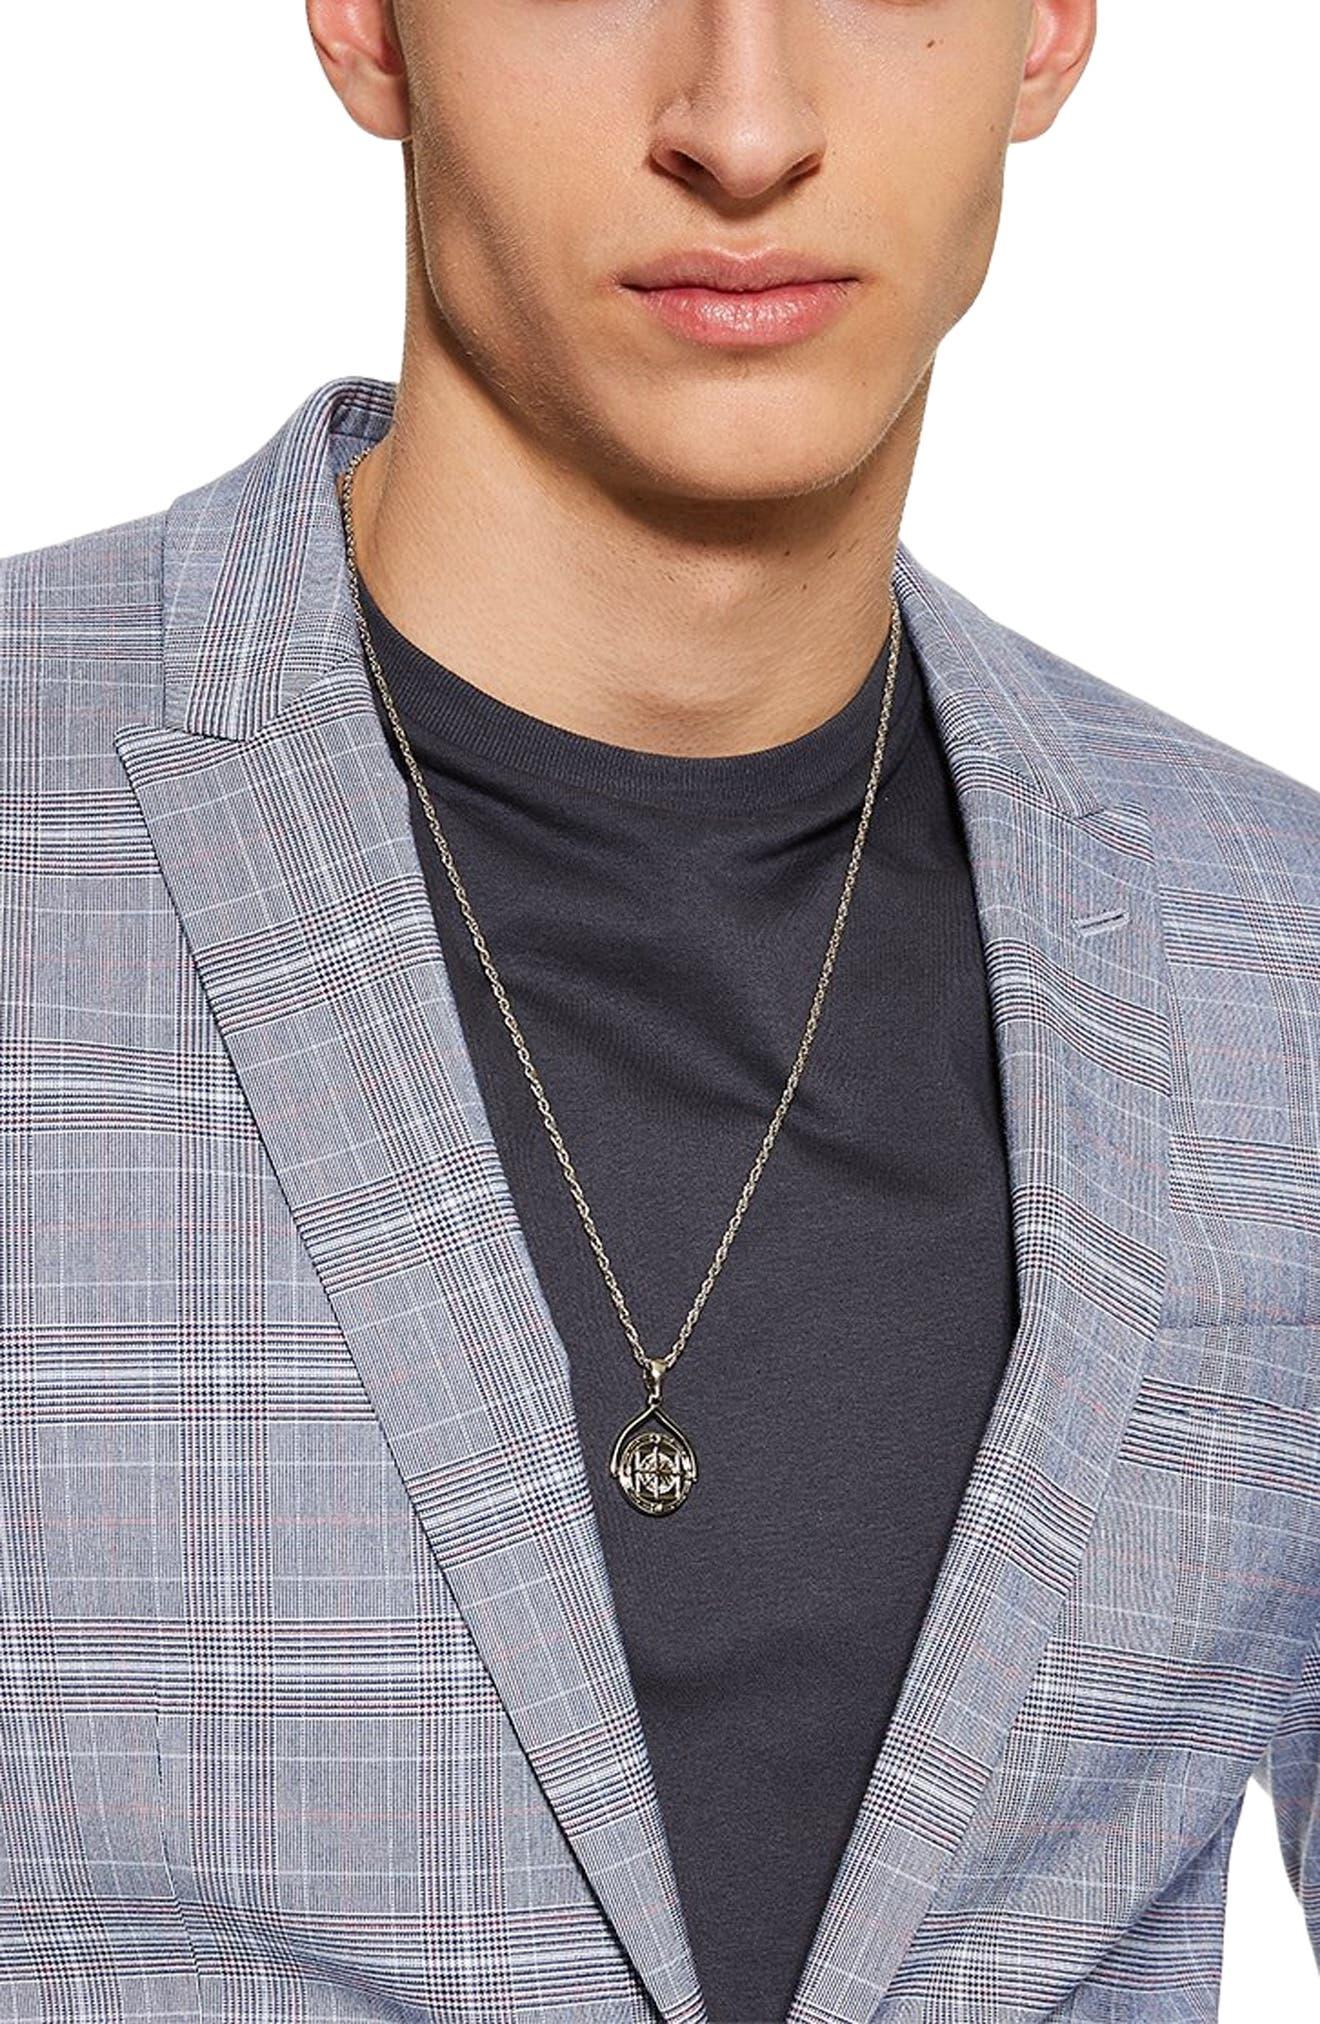 TOPMAN, Skinny Fit Suit Jacket, Alternate thumbnail 3, color, BLUE MULTI